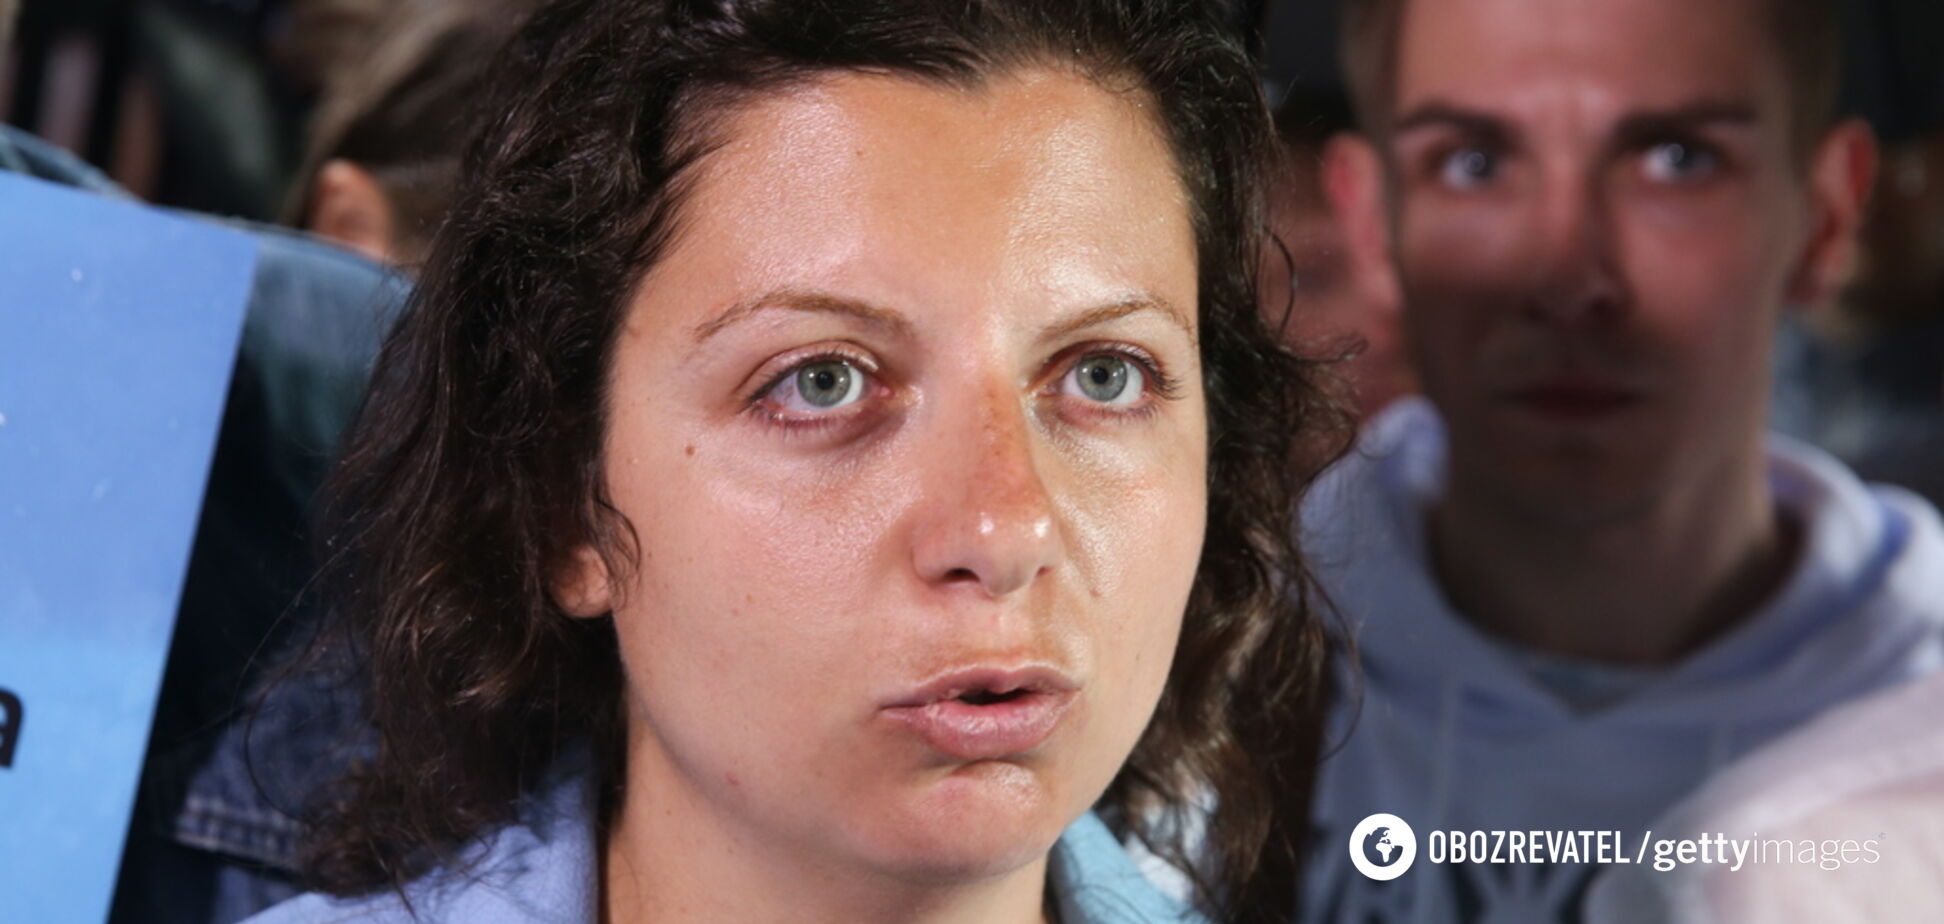 'Двушка с вонючим подъездом': пропагандистка Путина пожаловалась на жалкую жизнь